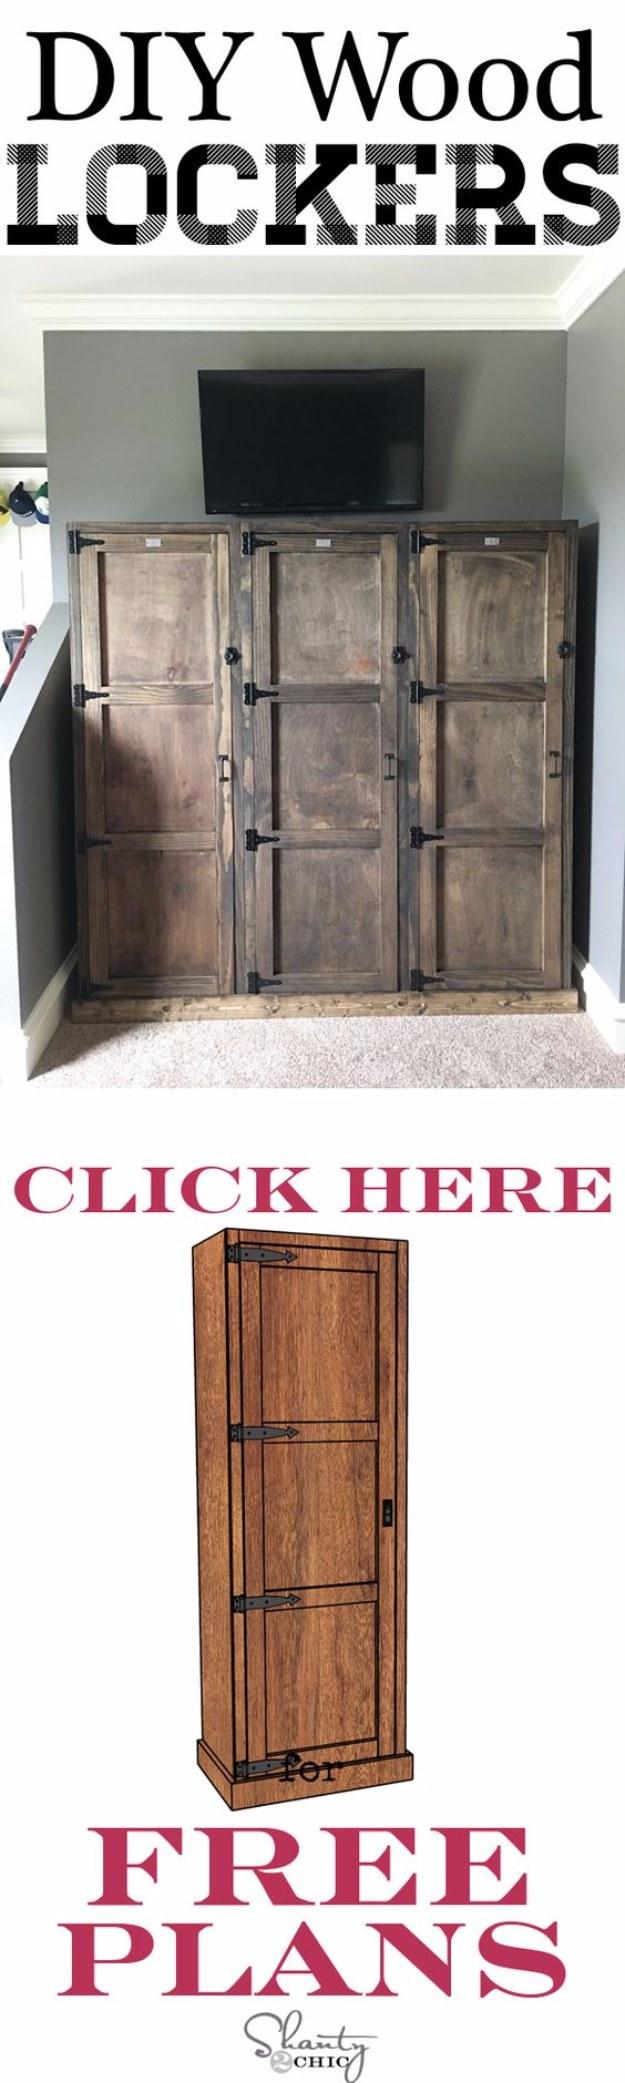 DIY Projects Your Garage Needs -DIY Garage Locker System - Do It Yourself Garage Makeover Ideas Include Storage, Organization, Shelves, and Project Plans for Cool New Garage Decor #diy #garage #homeimprovement